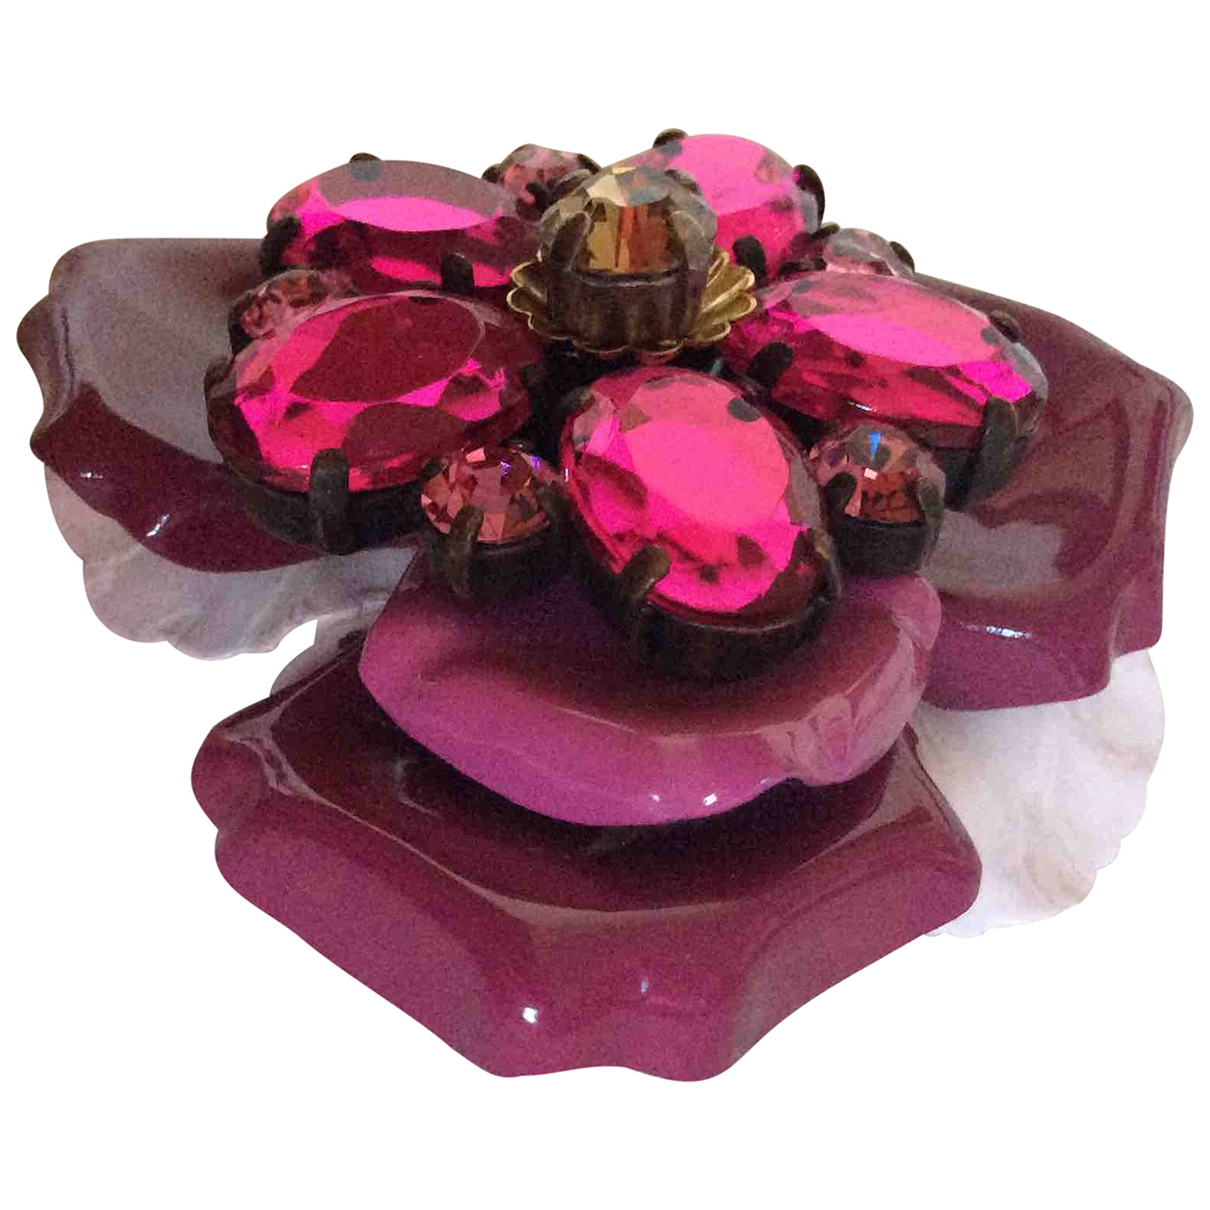 Broche Motifs Floraux en Plastico Rosa Non Signe / Unsigned